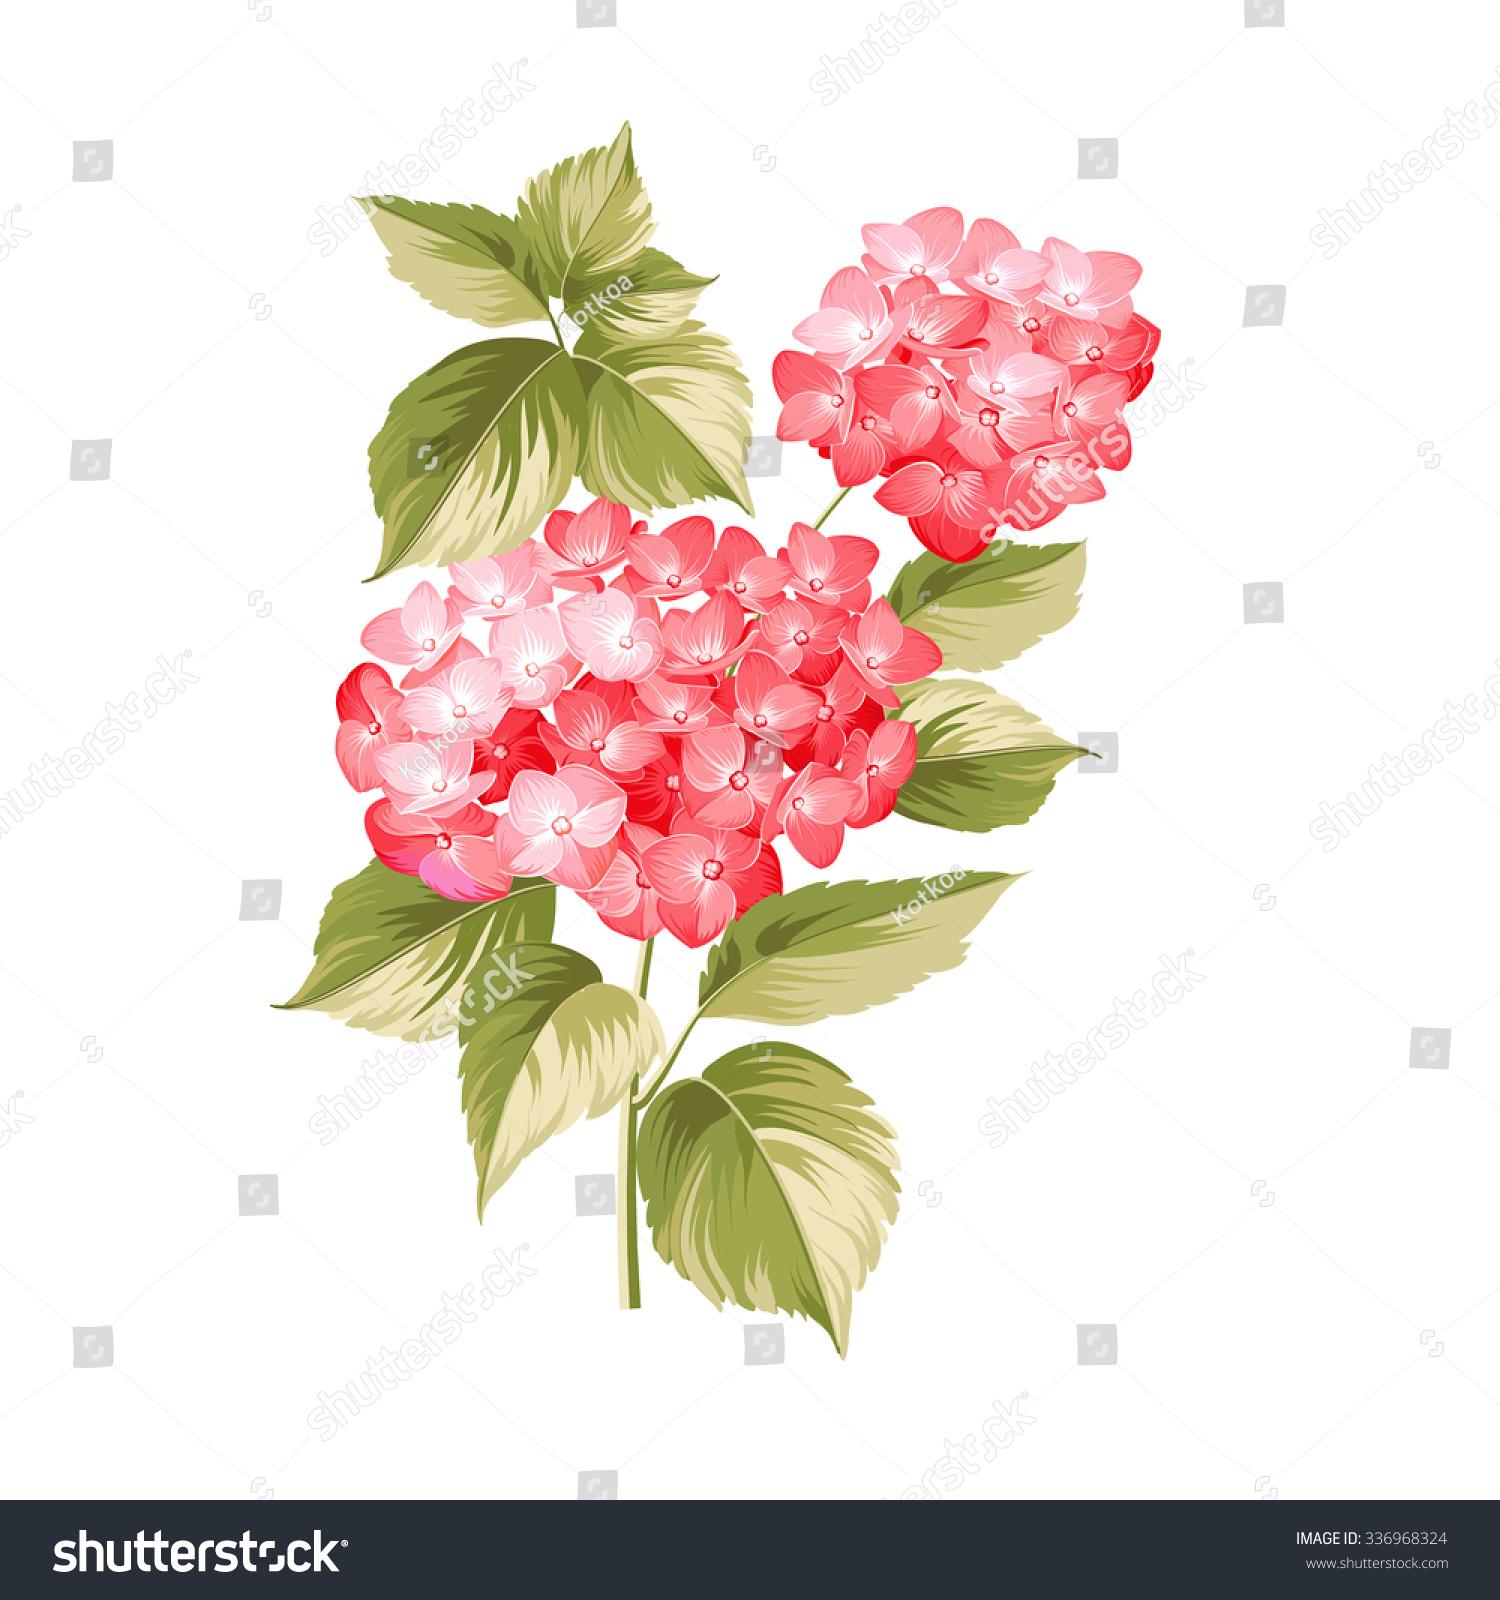 Hortensia Flower Red Realistic Hydrangea Illustration 스톡